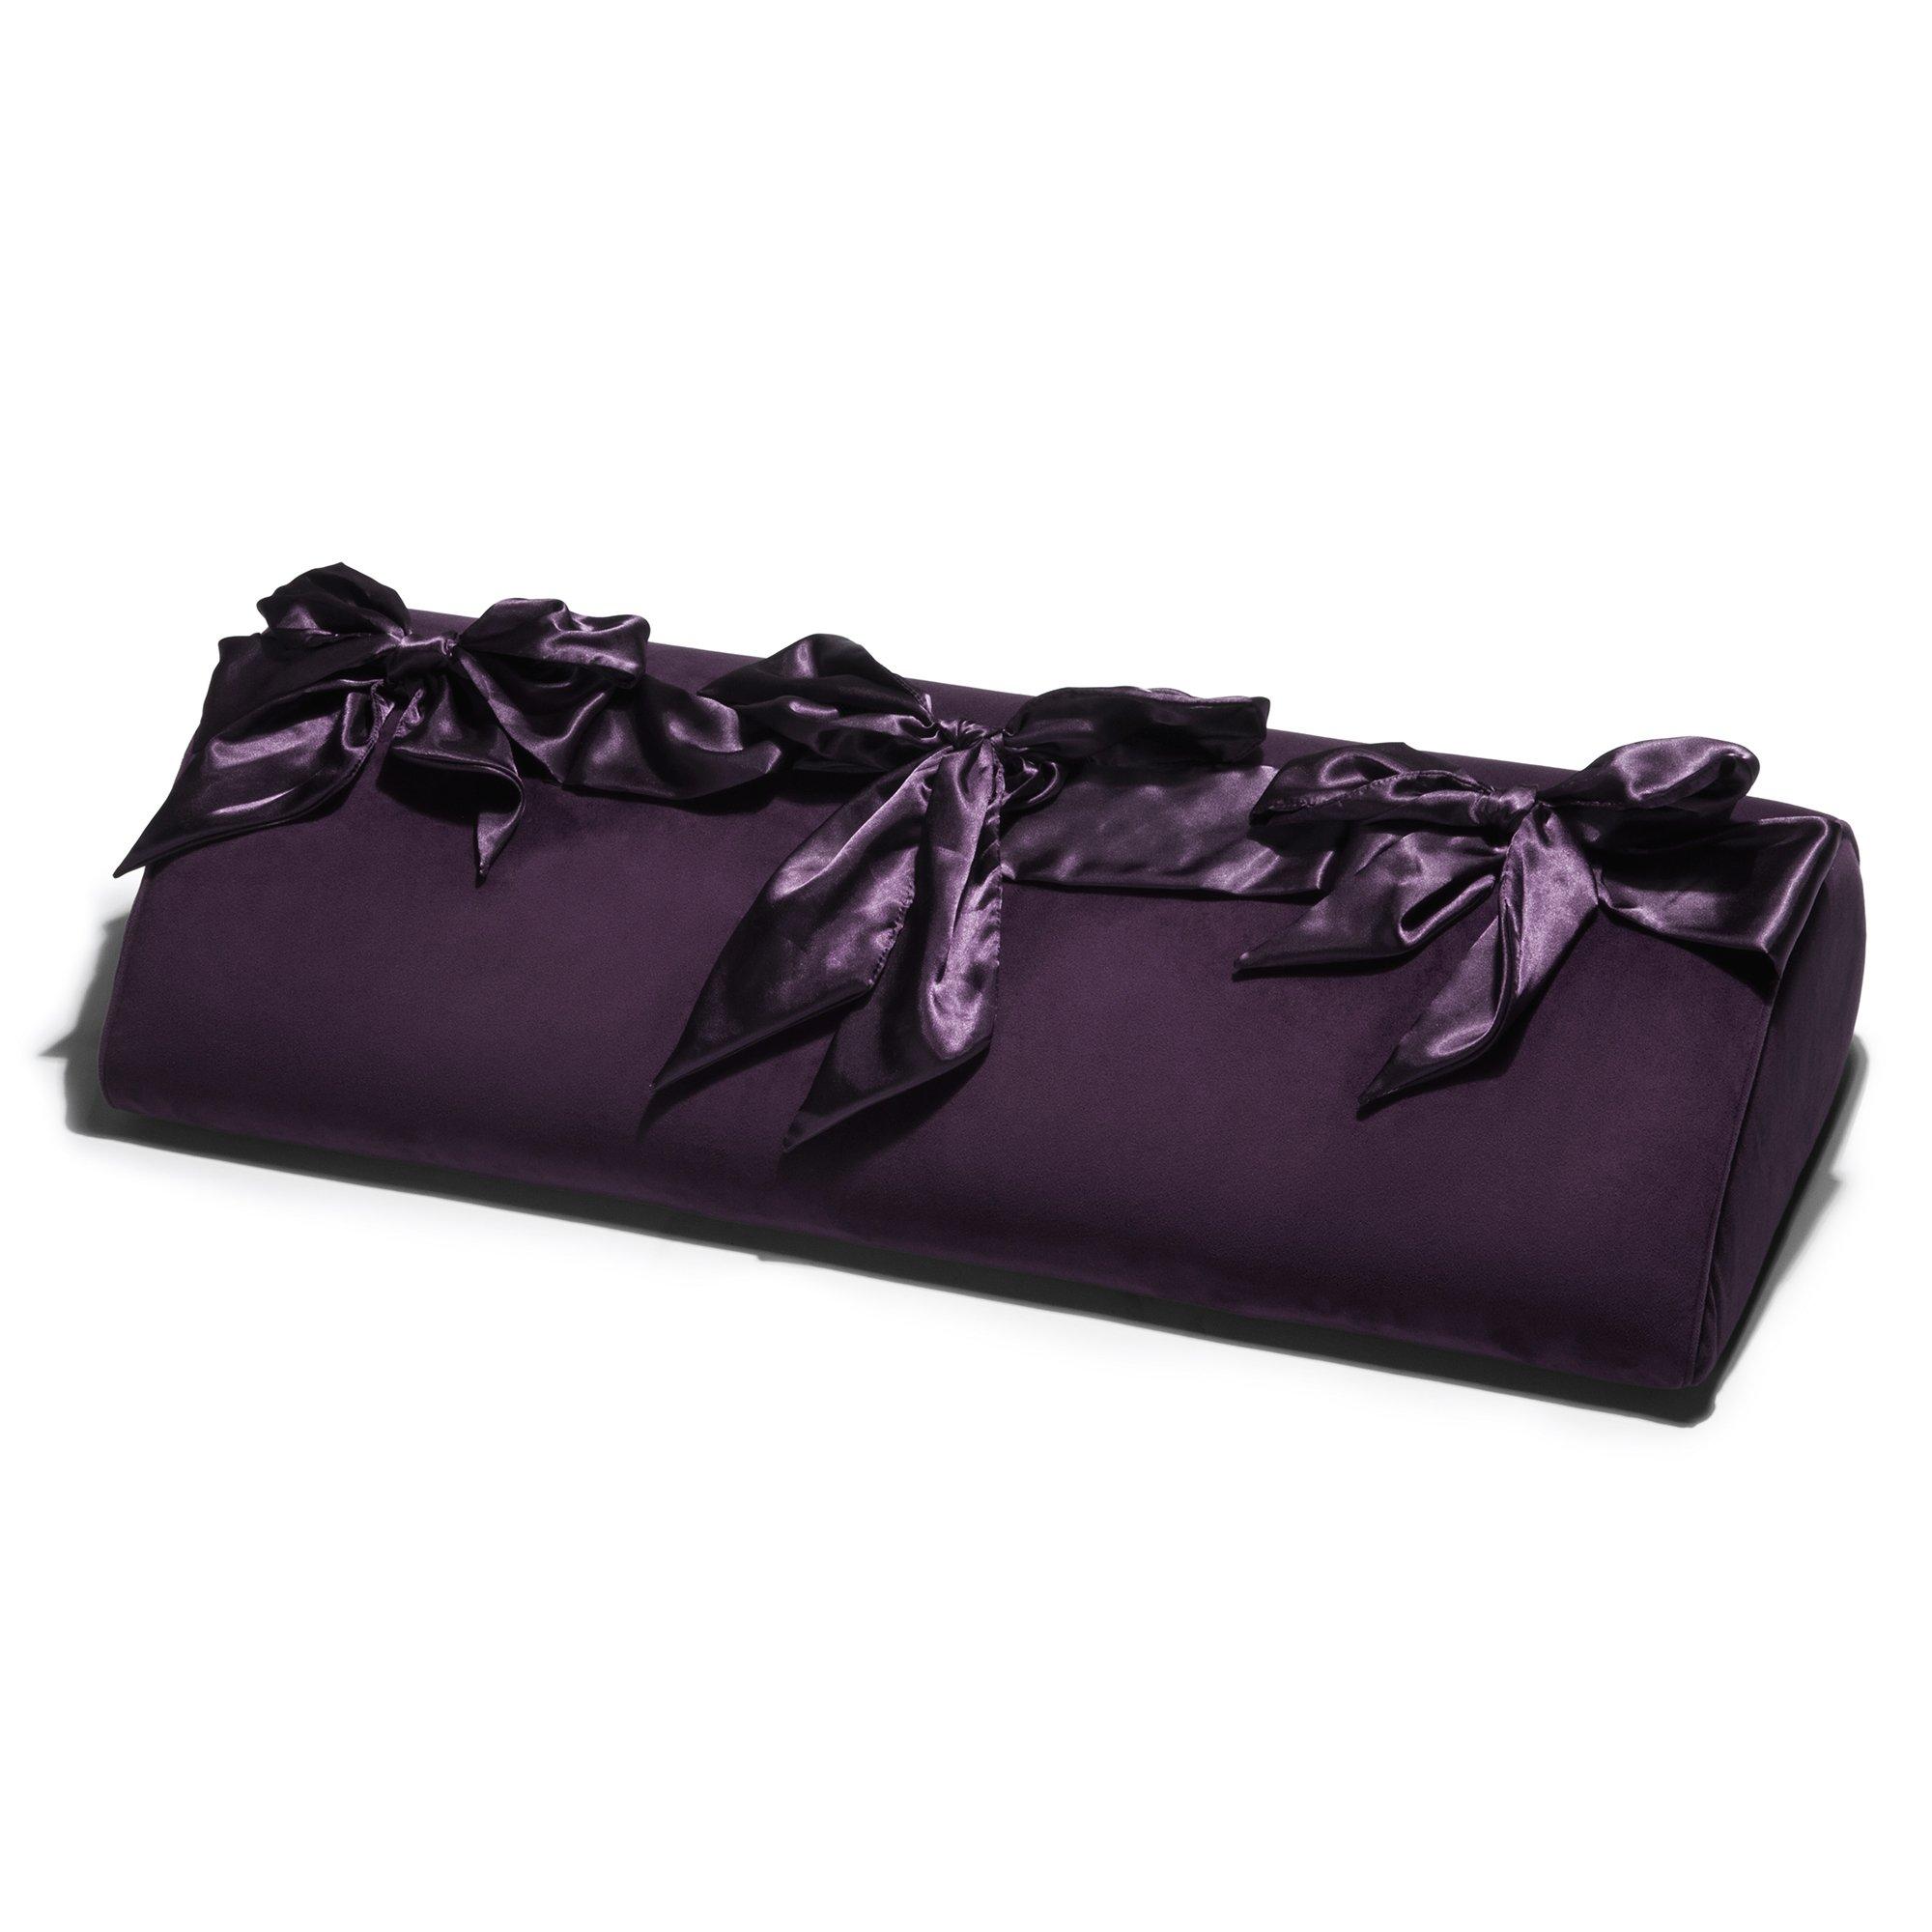 Liberator Decor Series Lovearts Pillow, Aubergine